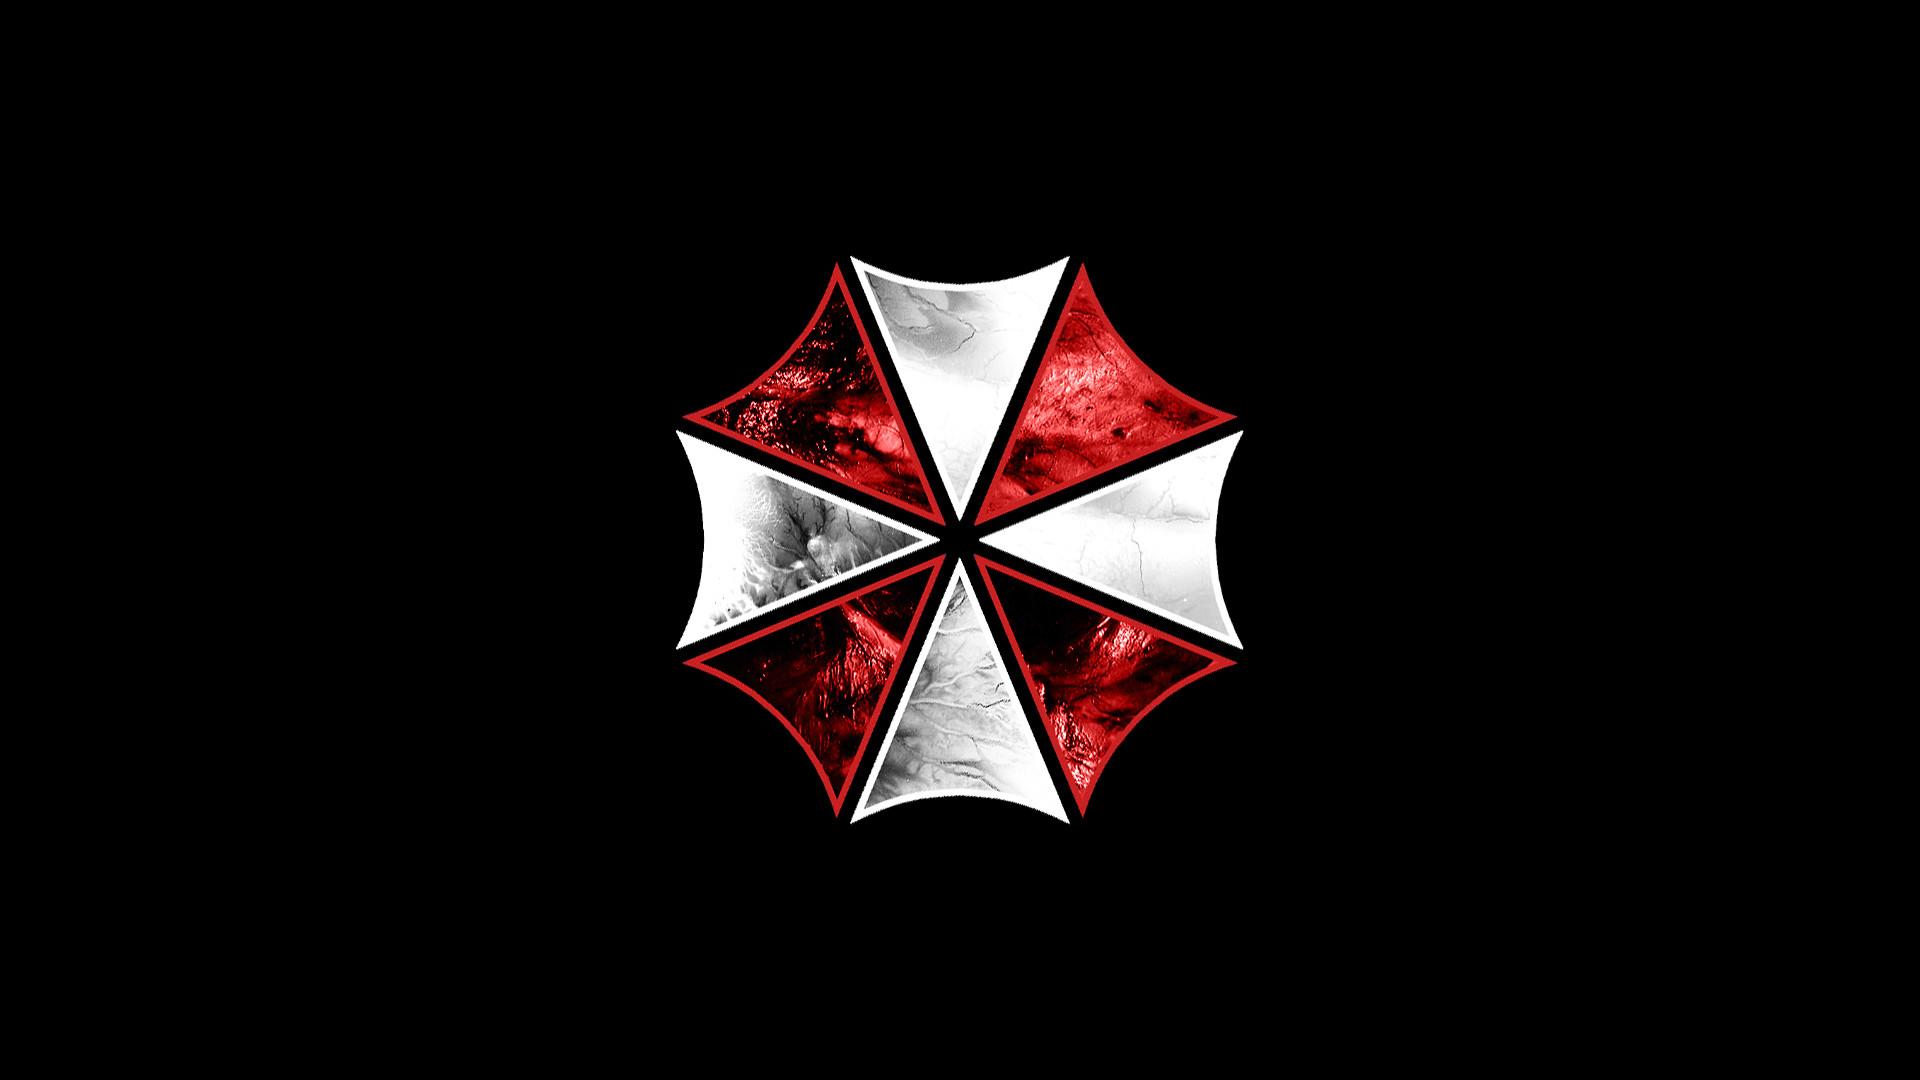 … Resident Evil Wallpaper Umbrella (6) …